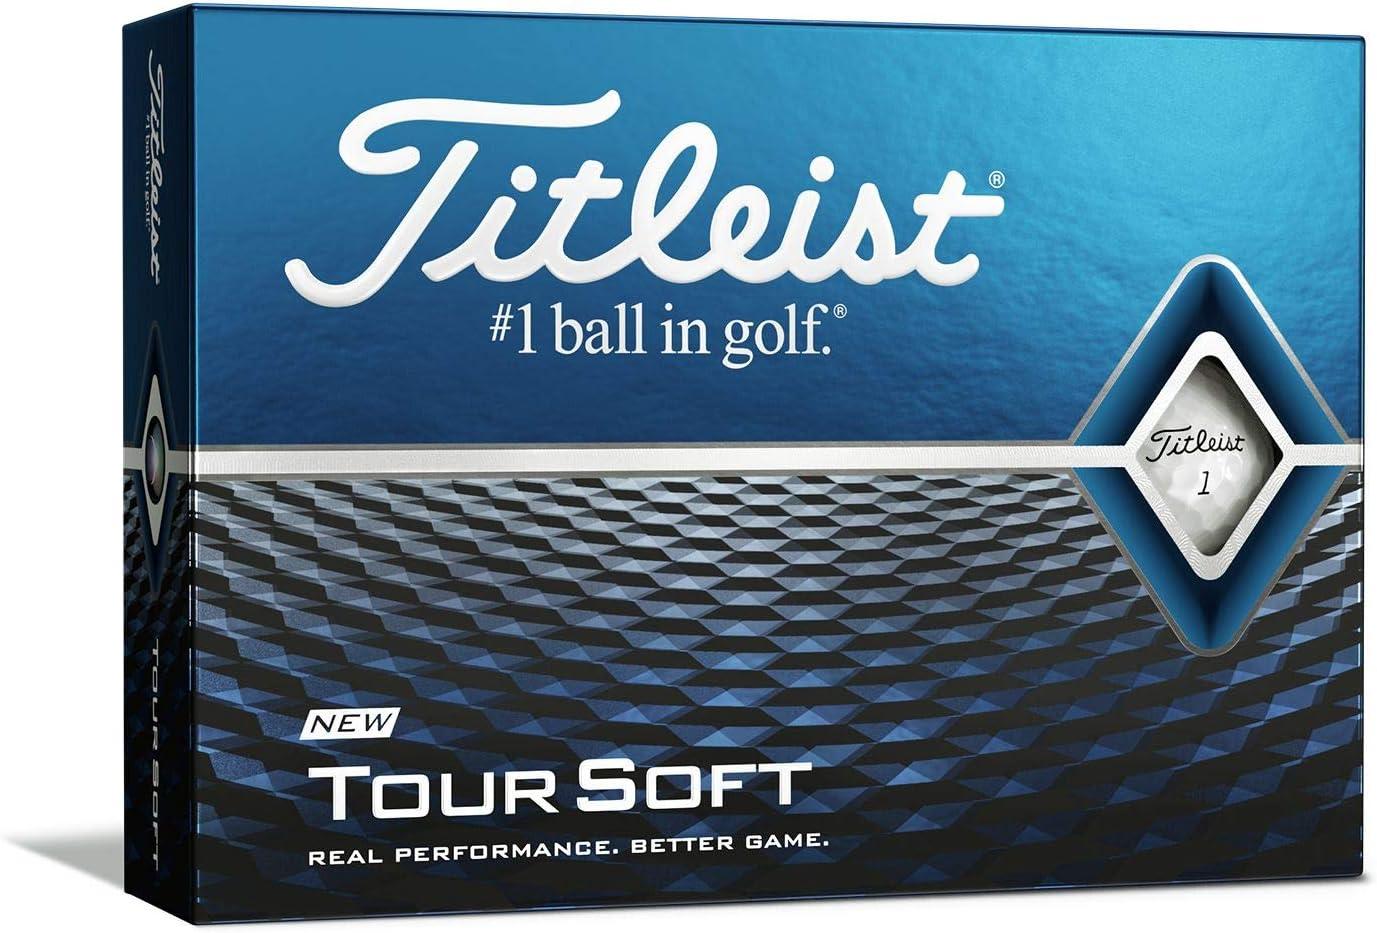 best golf ball for 85 mph swing speed